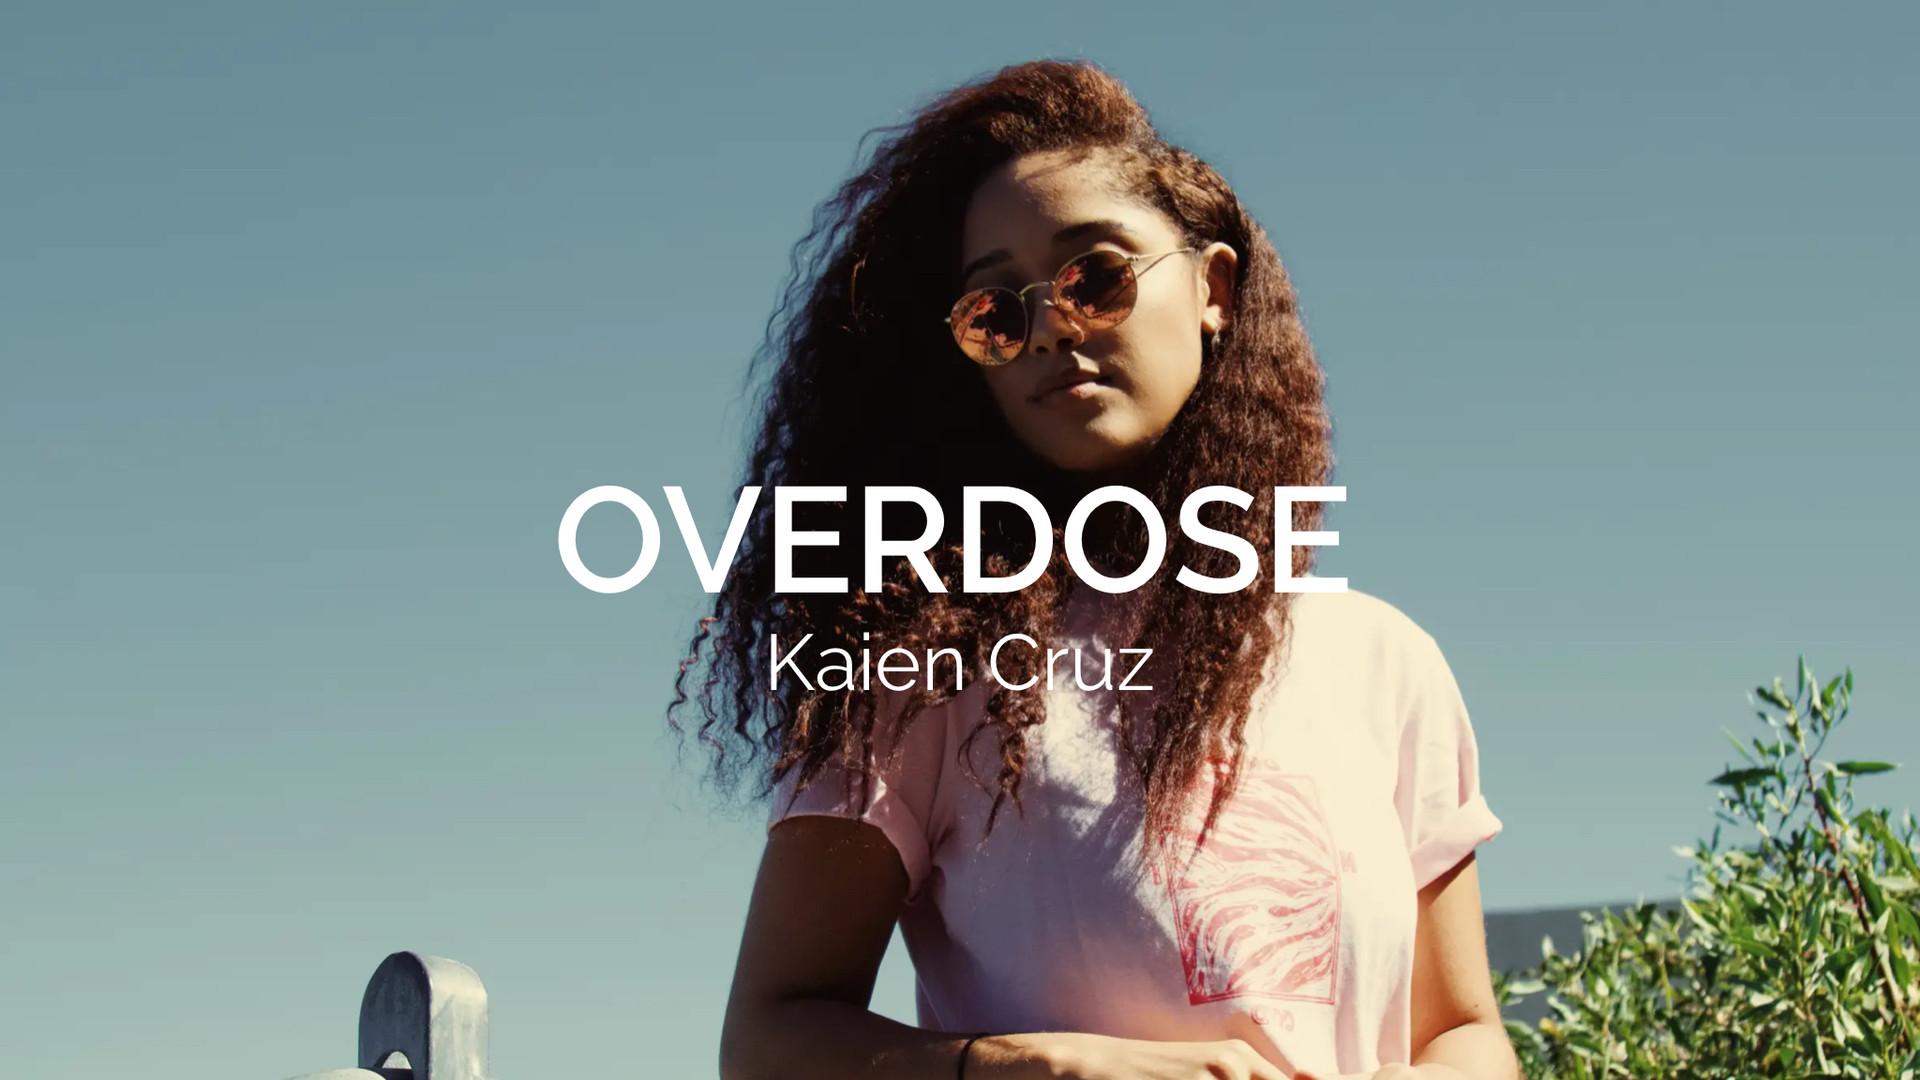 Kaien cruz | Overdose